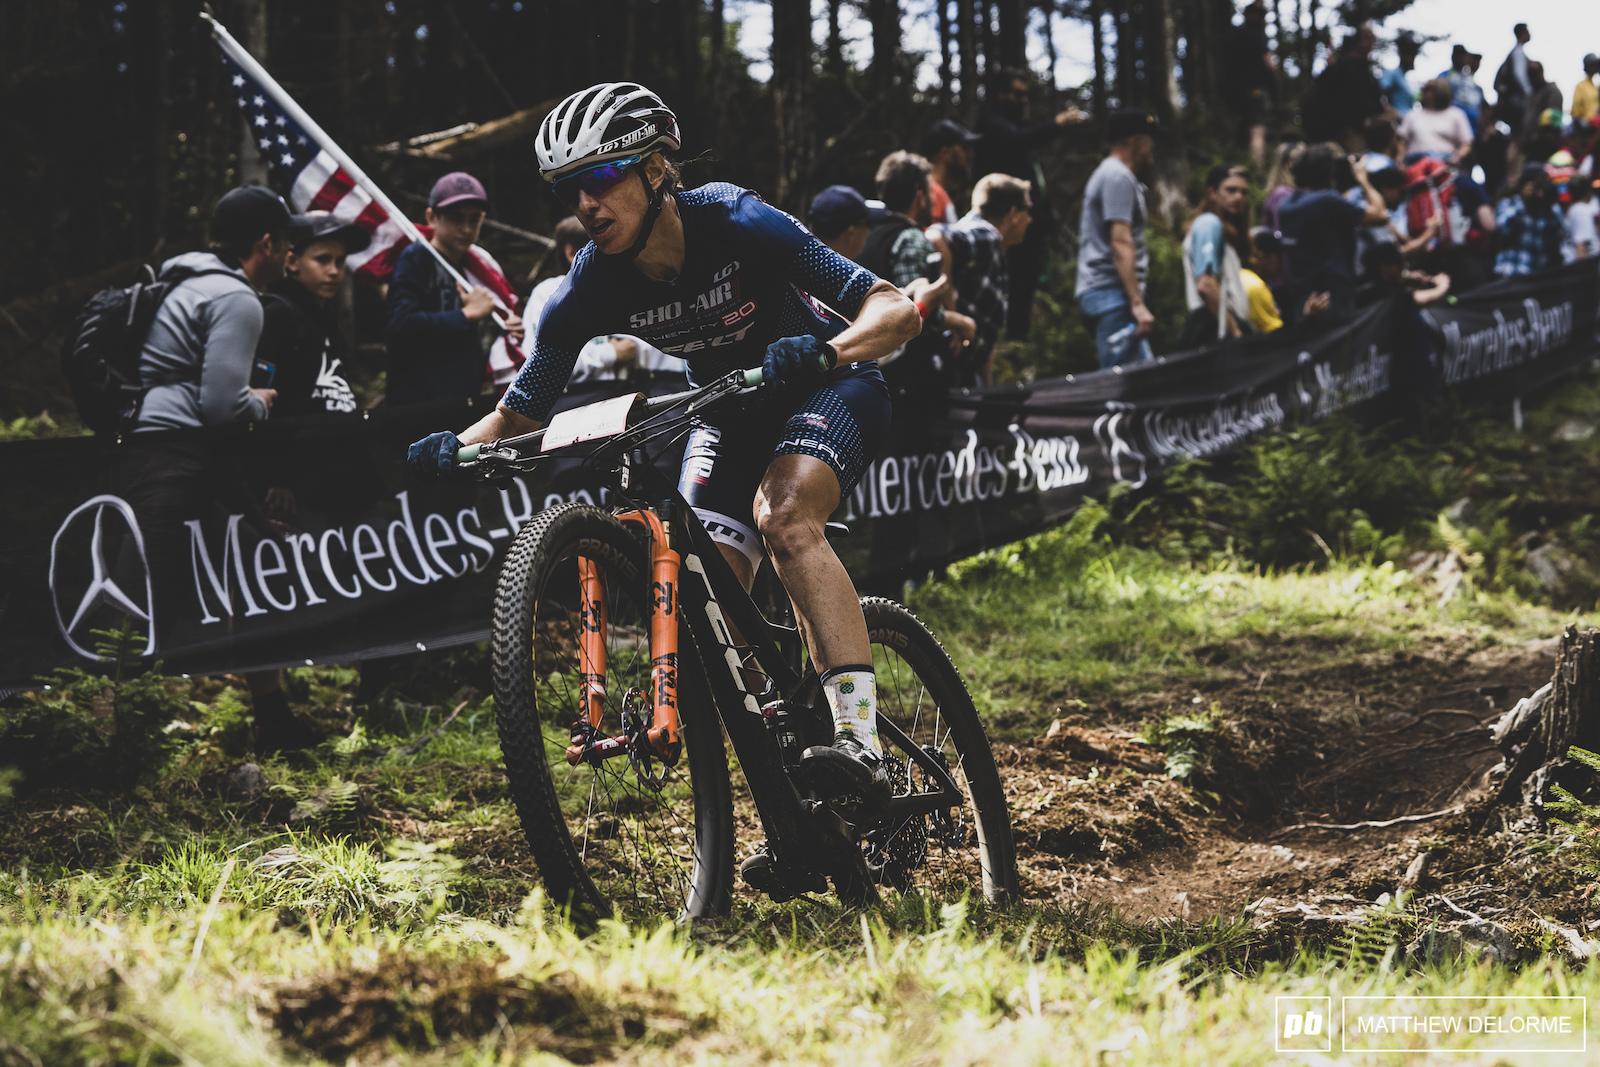 Lea Davison was on a tear to eighth place.